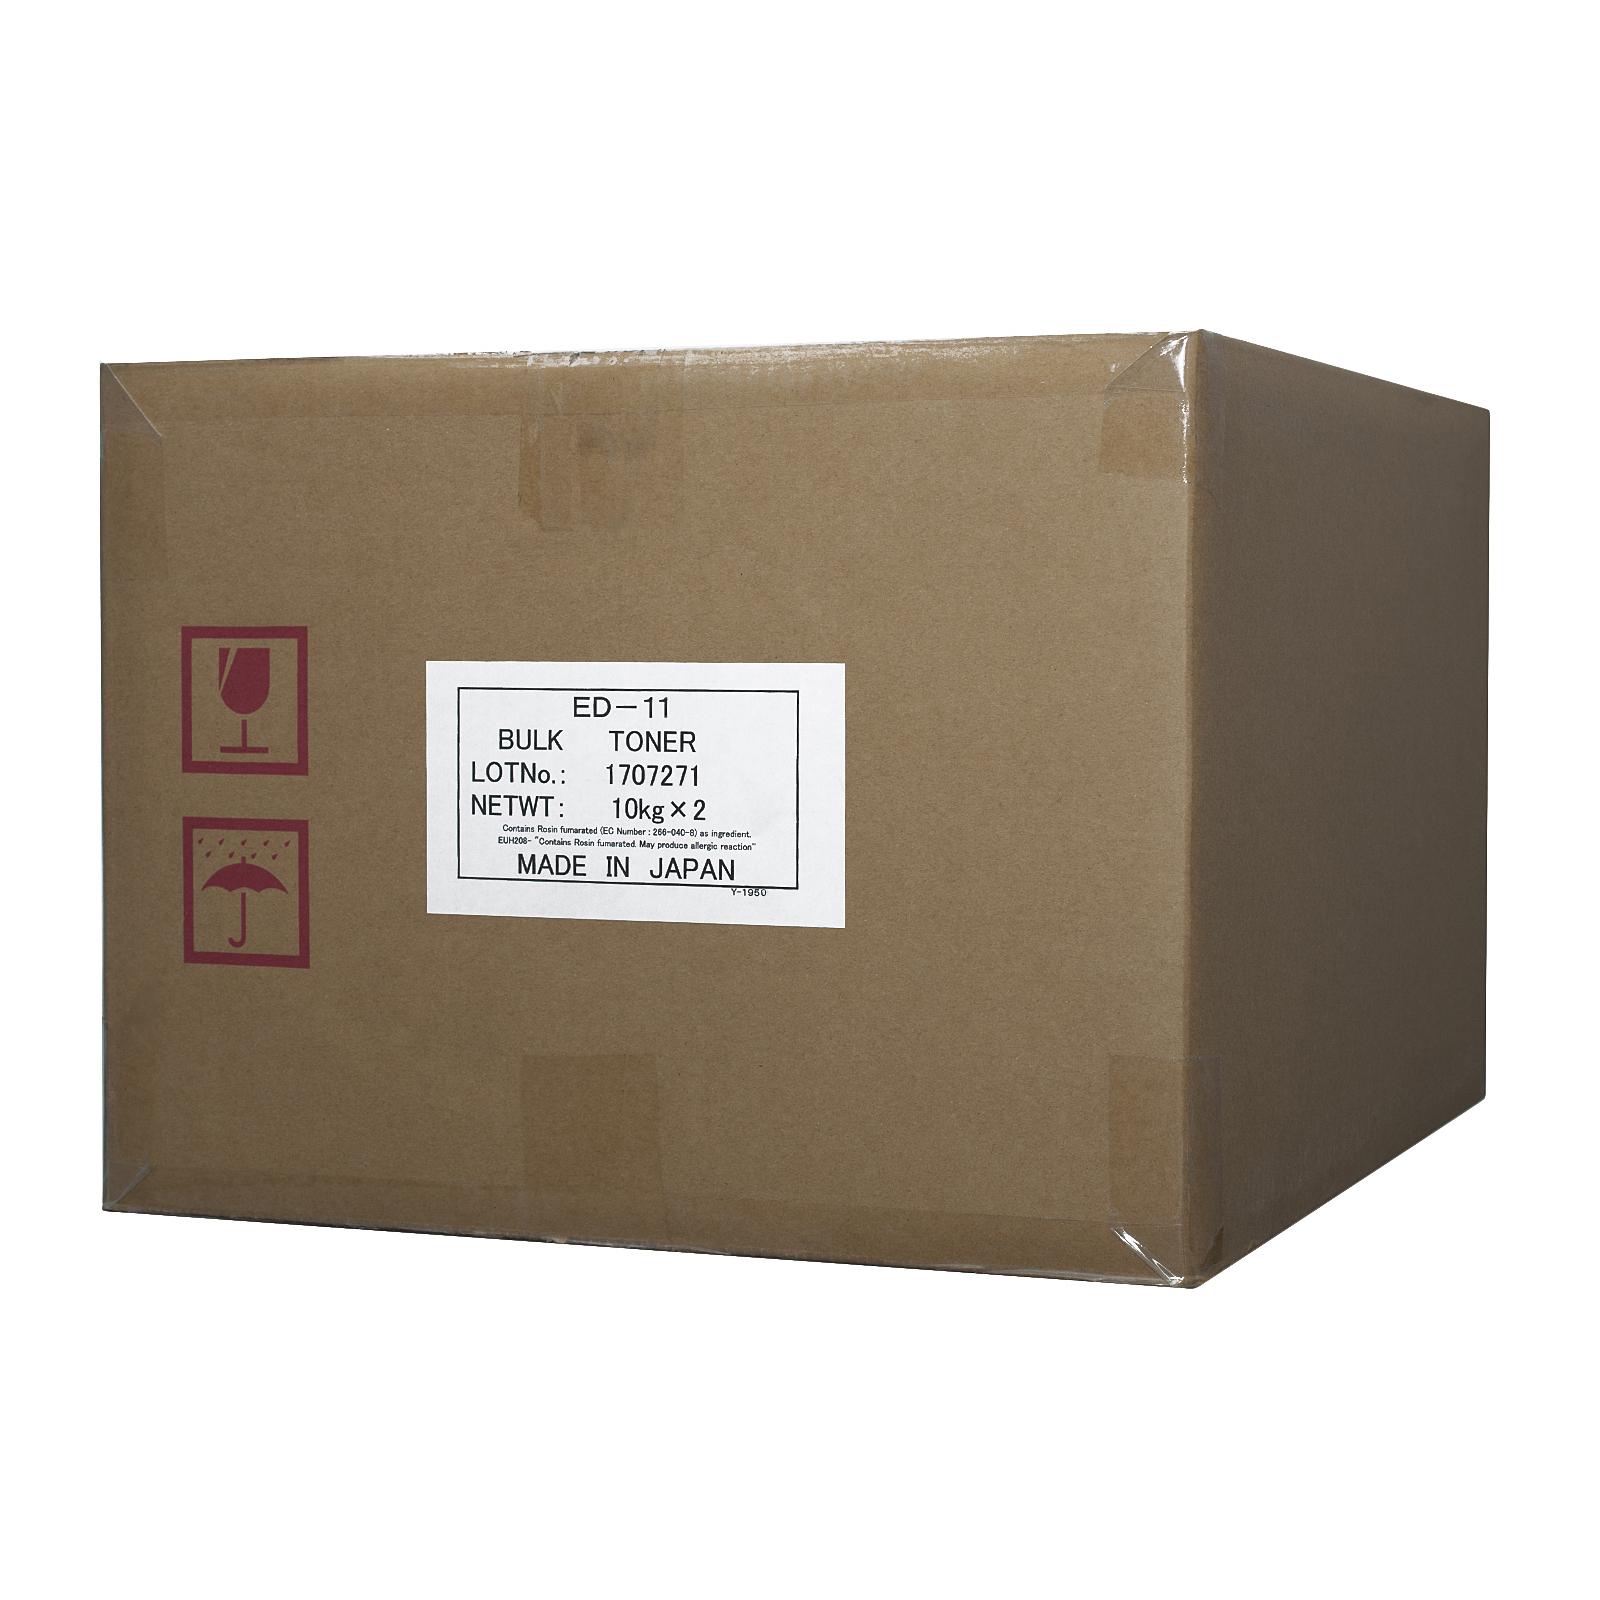 Тонер KYOCERA TK-1115/TK-1125 2x10кг Tomoegawa (TSM-ED-11-20)